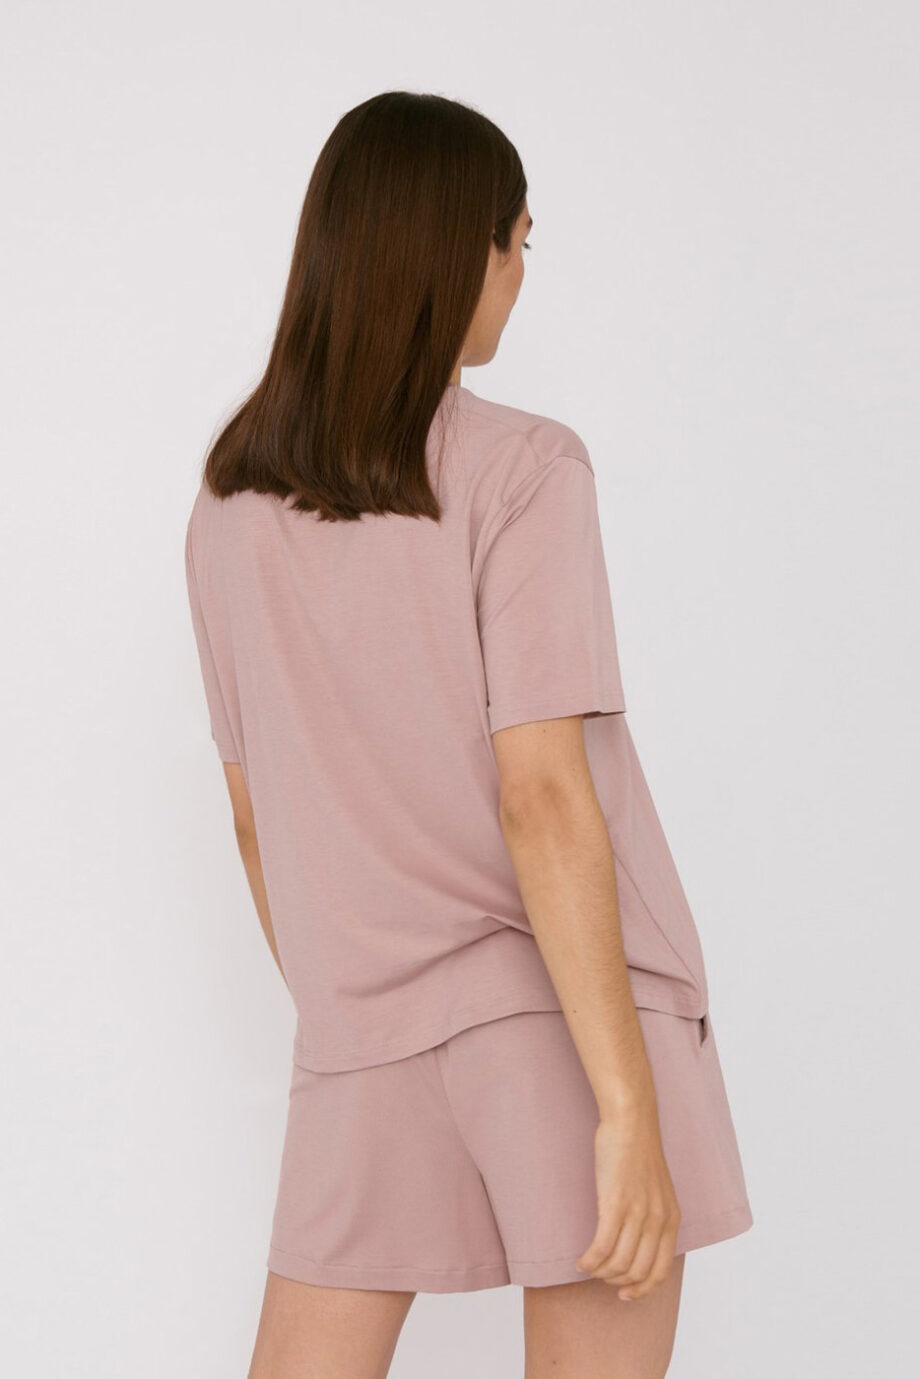 Organic Basics - T-shirt Tencel– Oud Roze_back